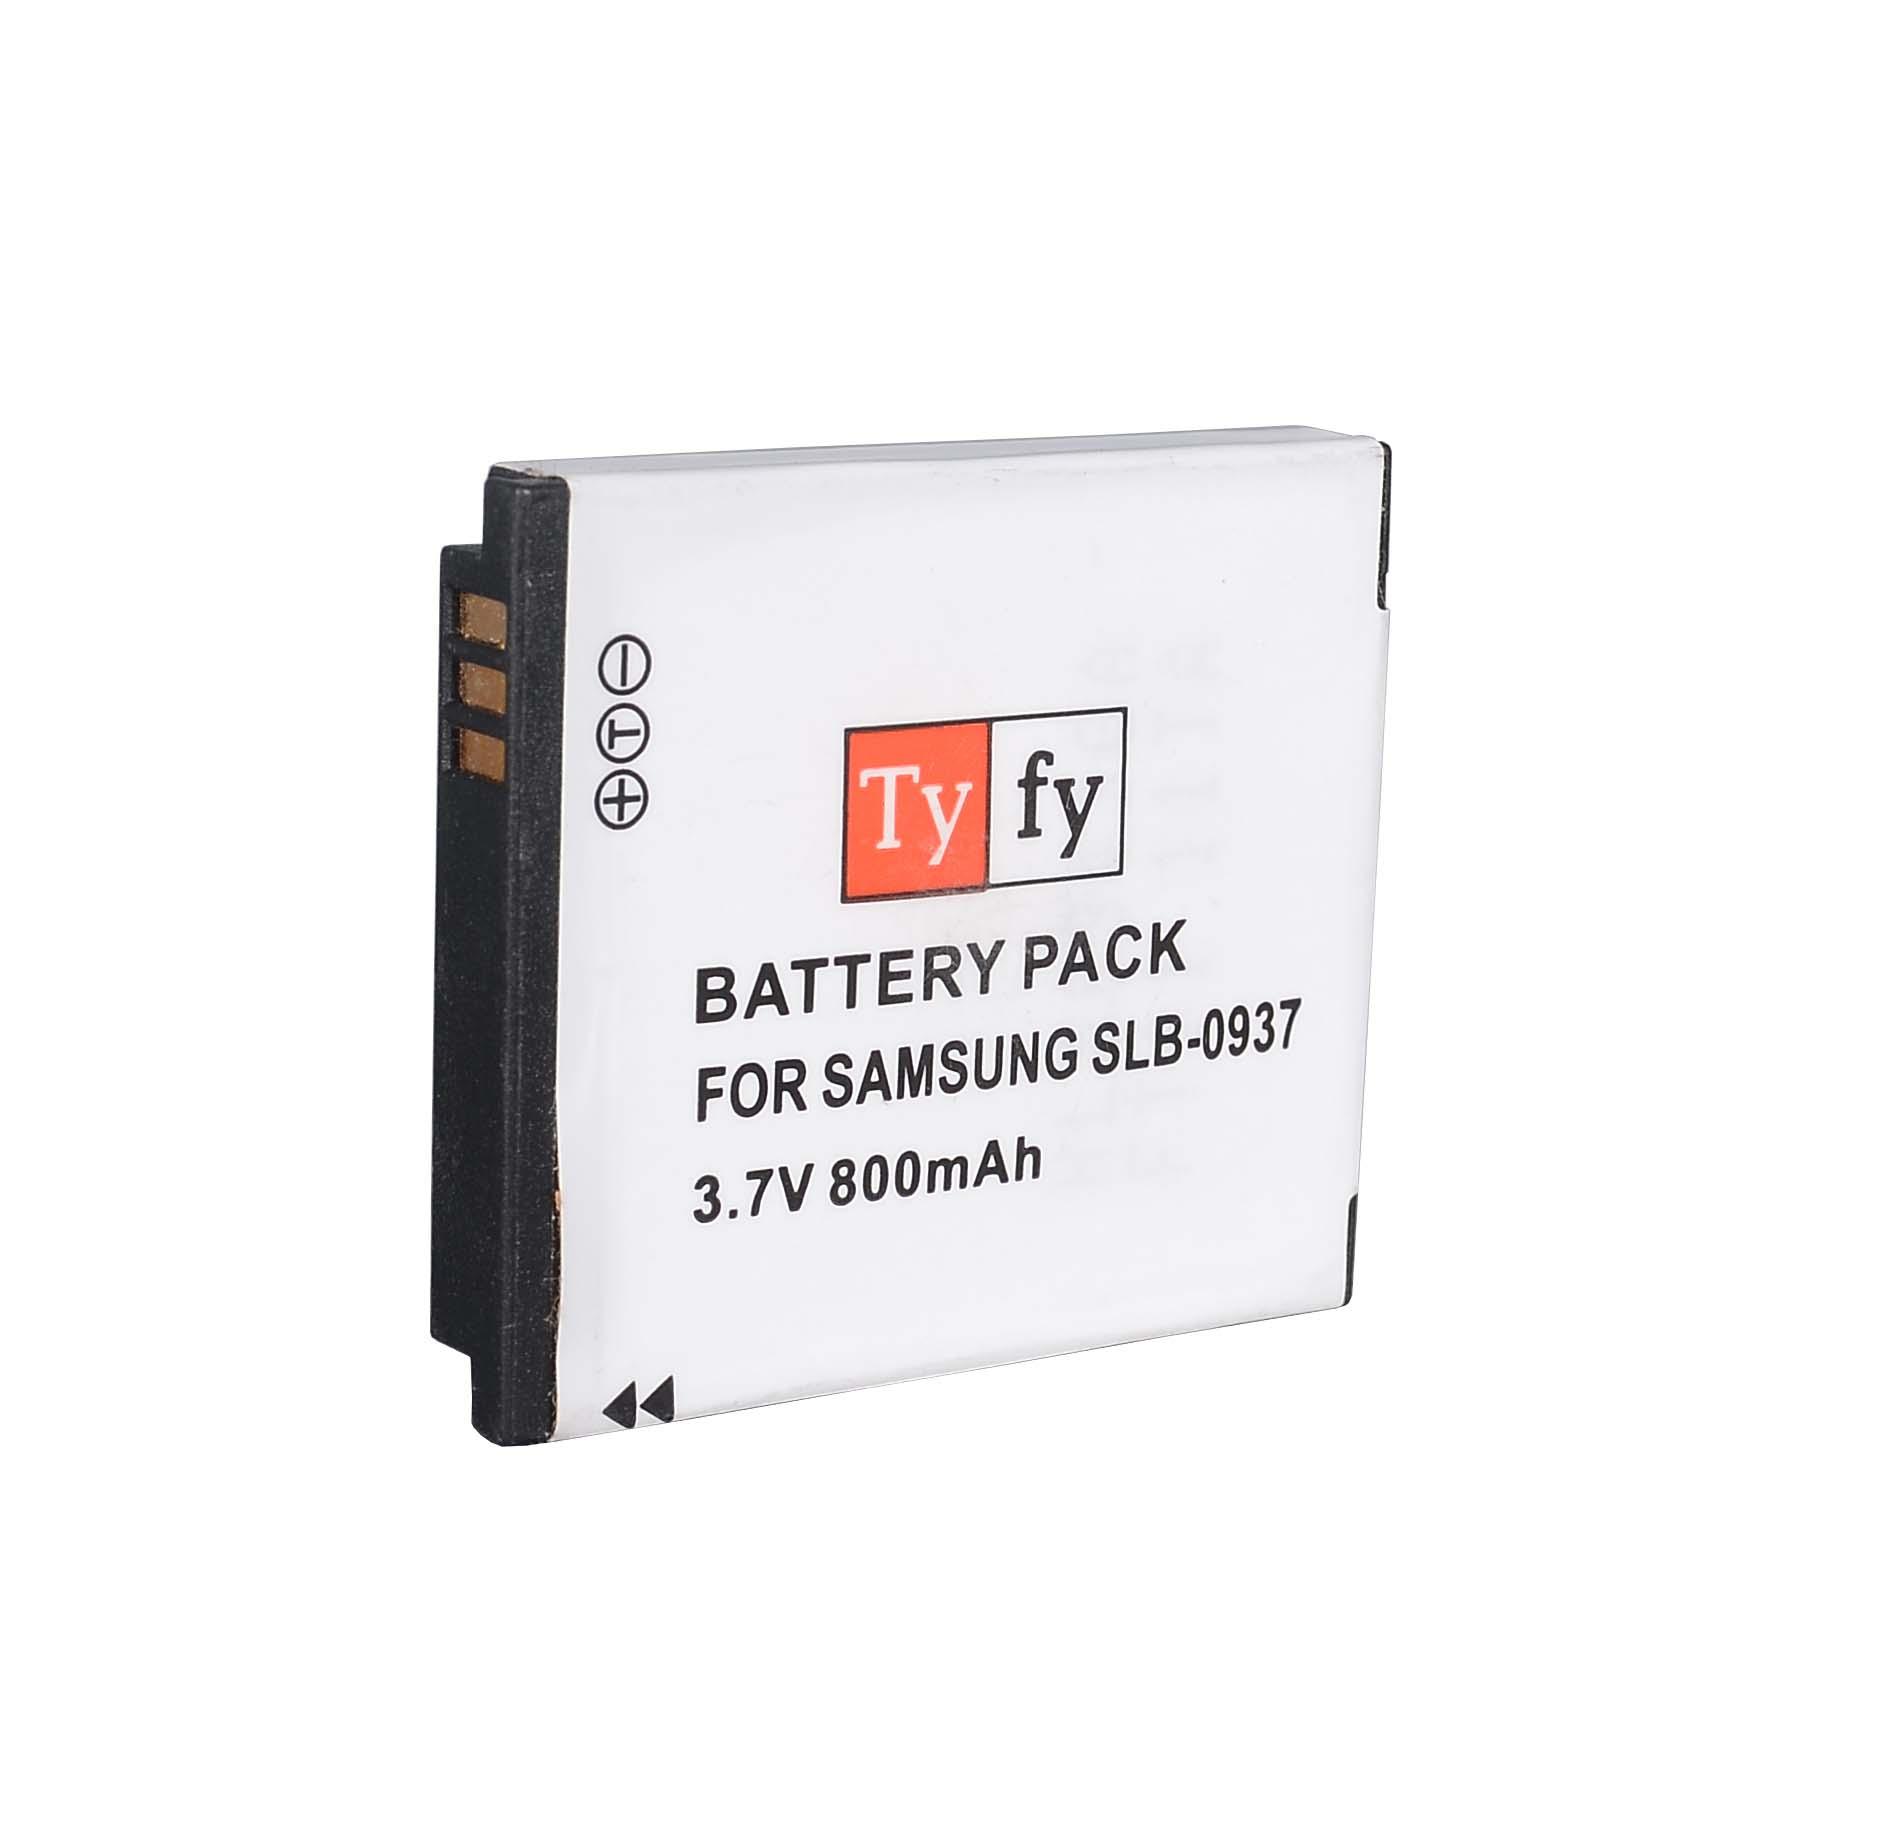 Batteria per Samsung Digimax SLB-0937